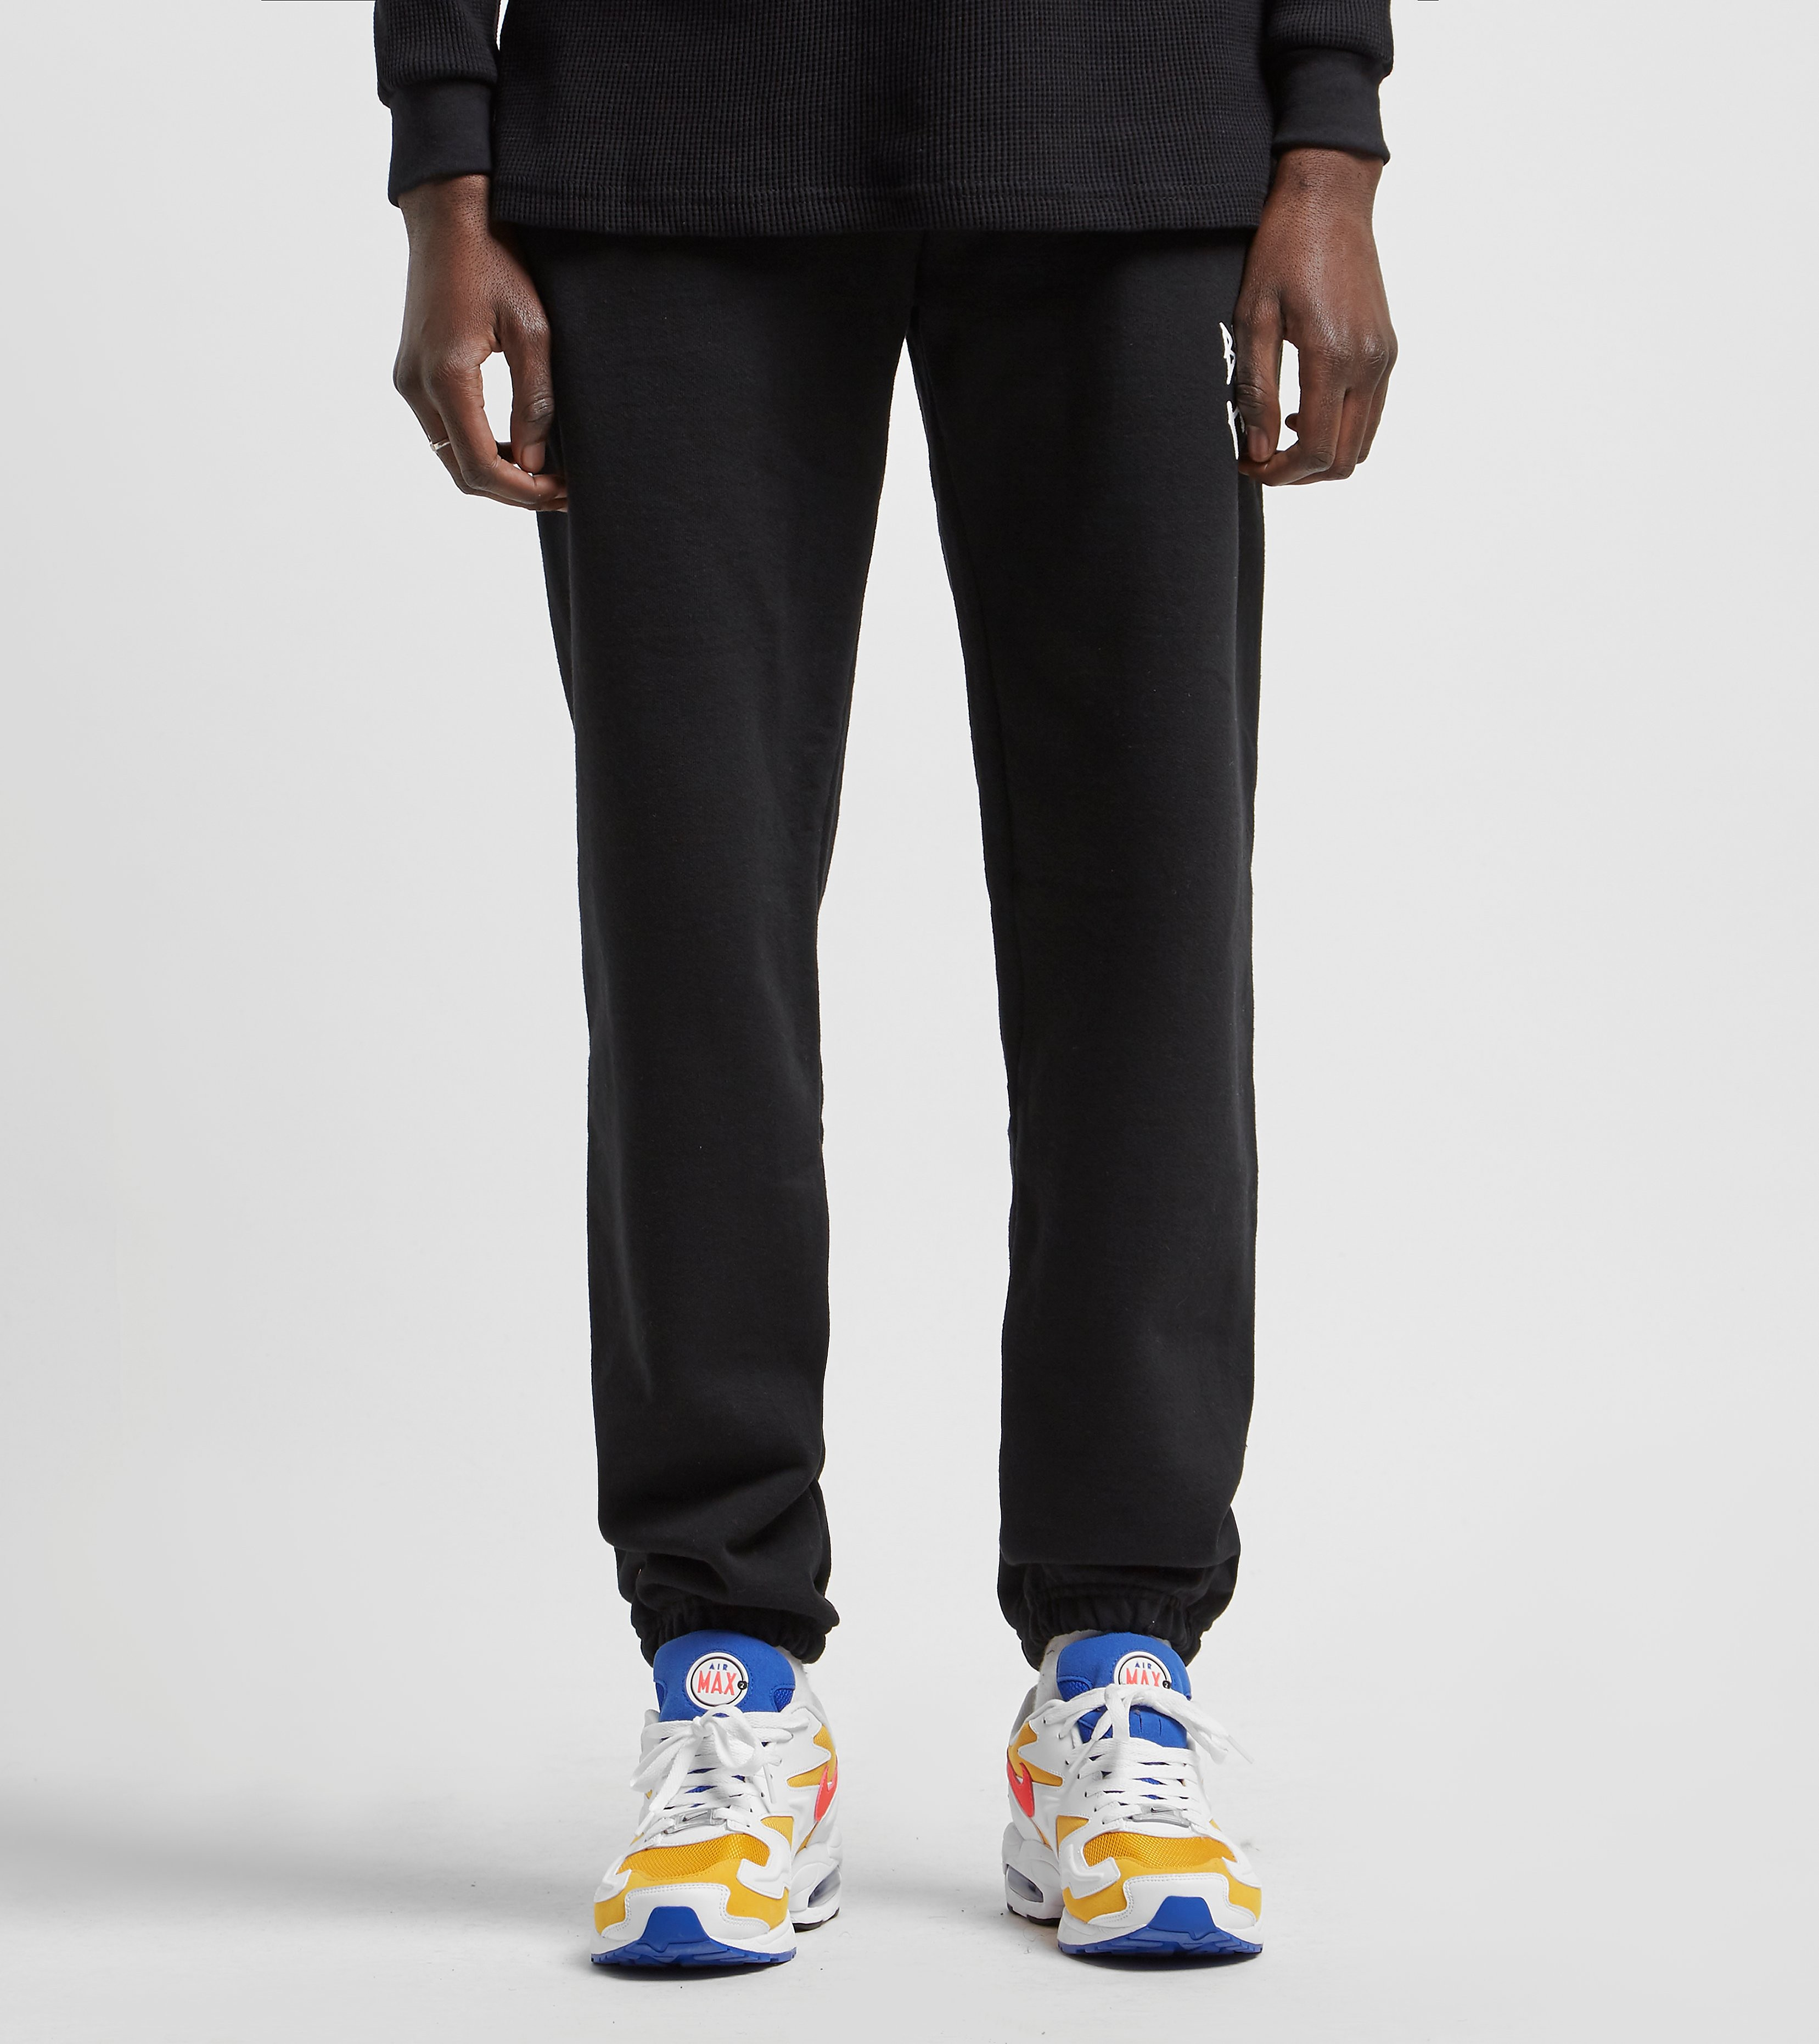 Brotherhood Pantalon de Survêtement, Noir